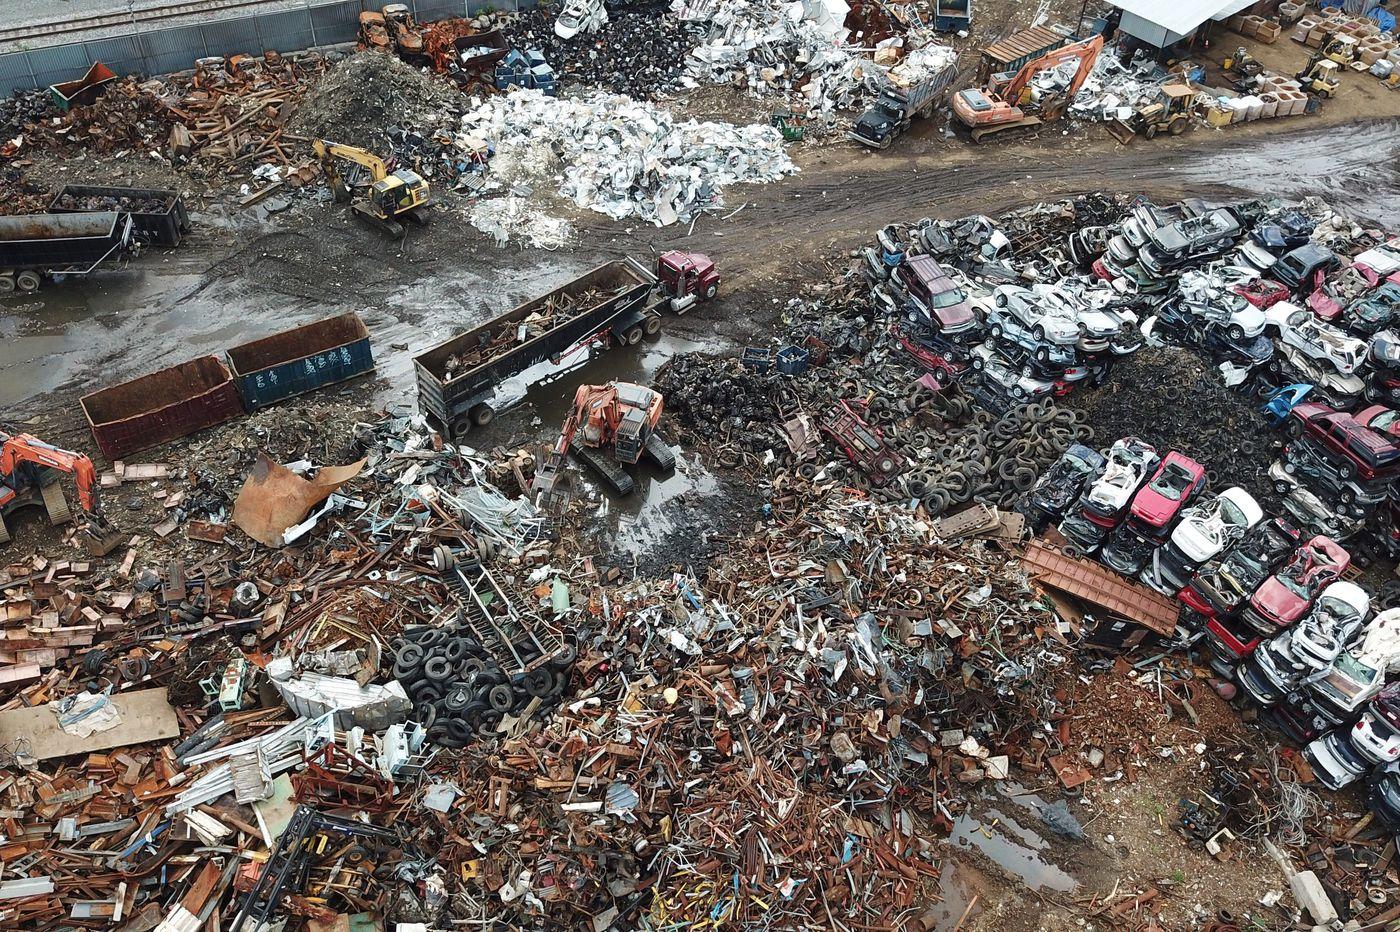 Philadelphia's junkyards are a dumpster fire